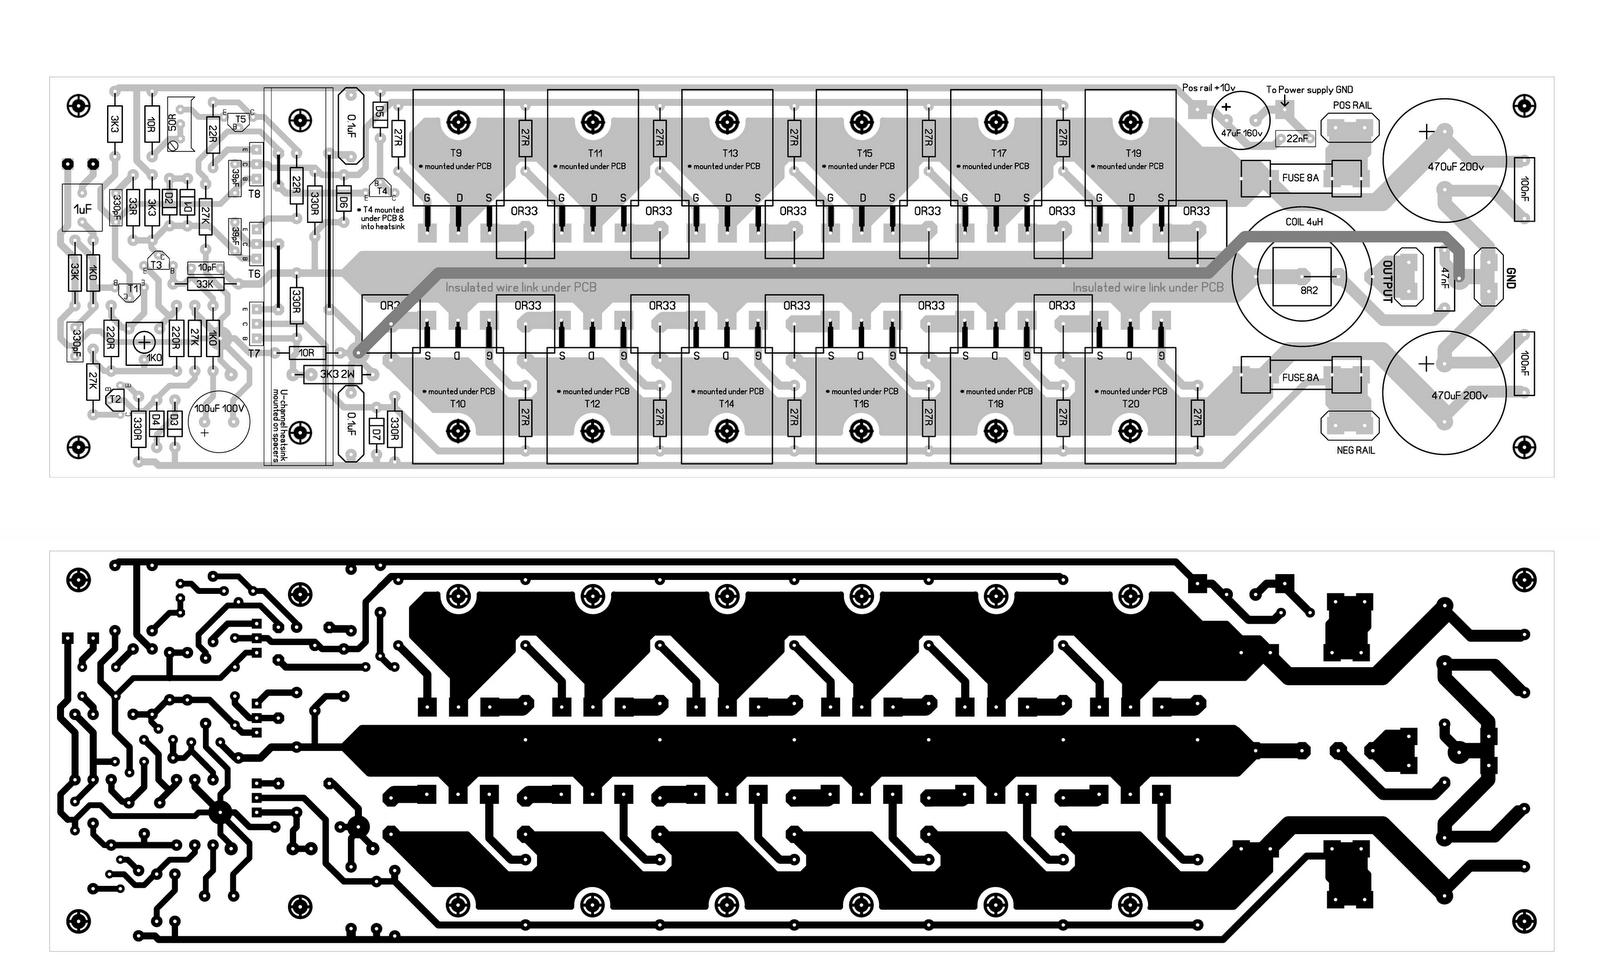 Insider 500 Watt Amb Cercuit Pcb Layout 500w Power Inverter Circuit Using Transistor 2n3055 Electronic Design 600 Mosfet Amplifier